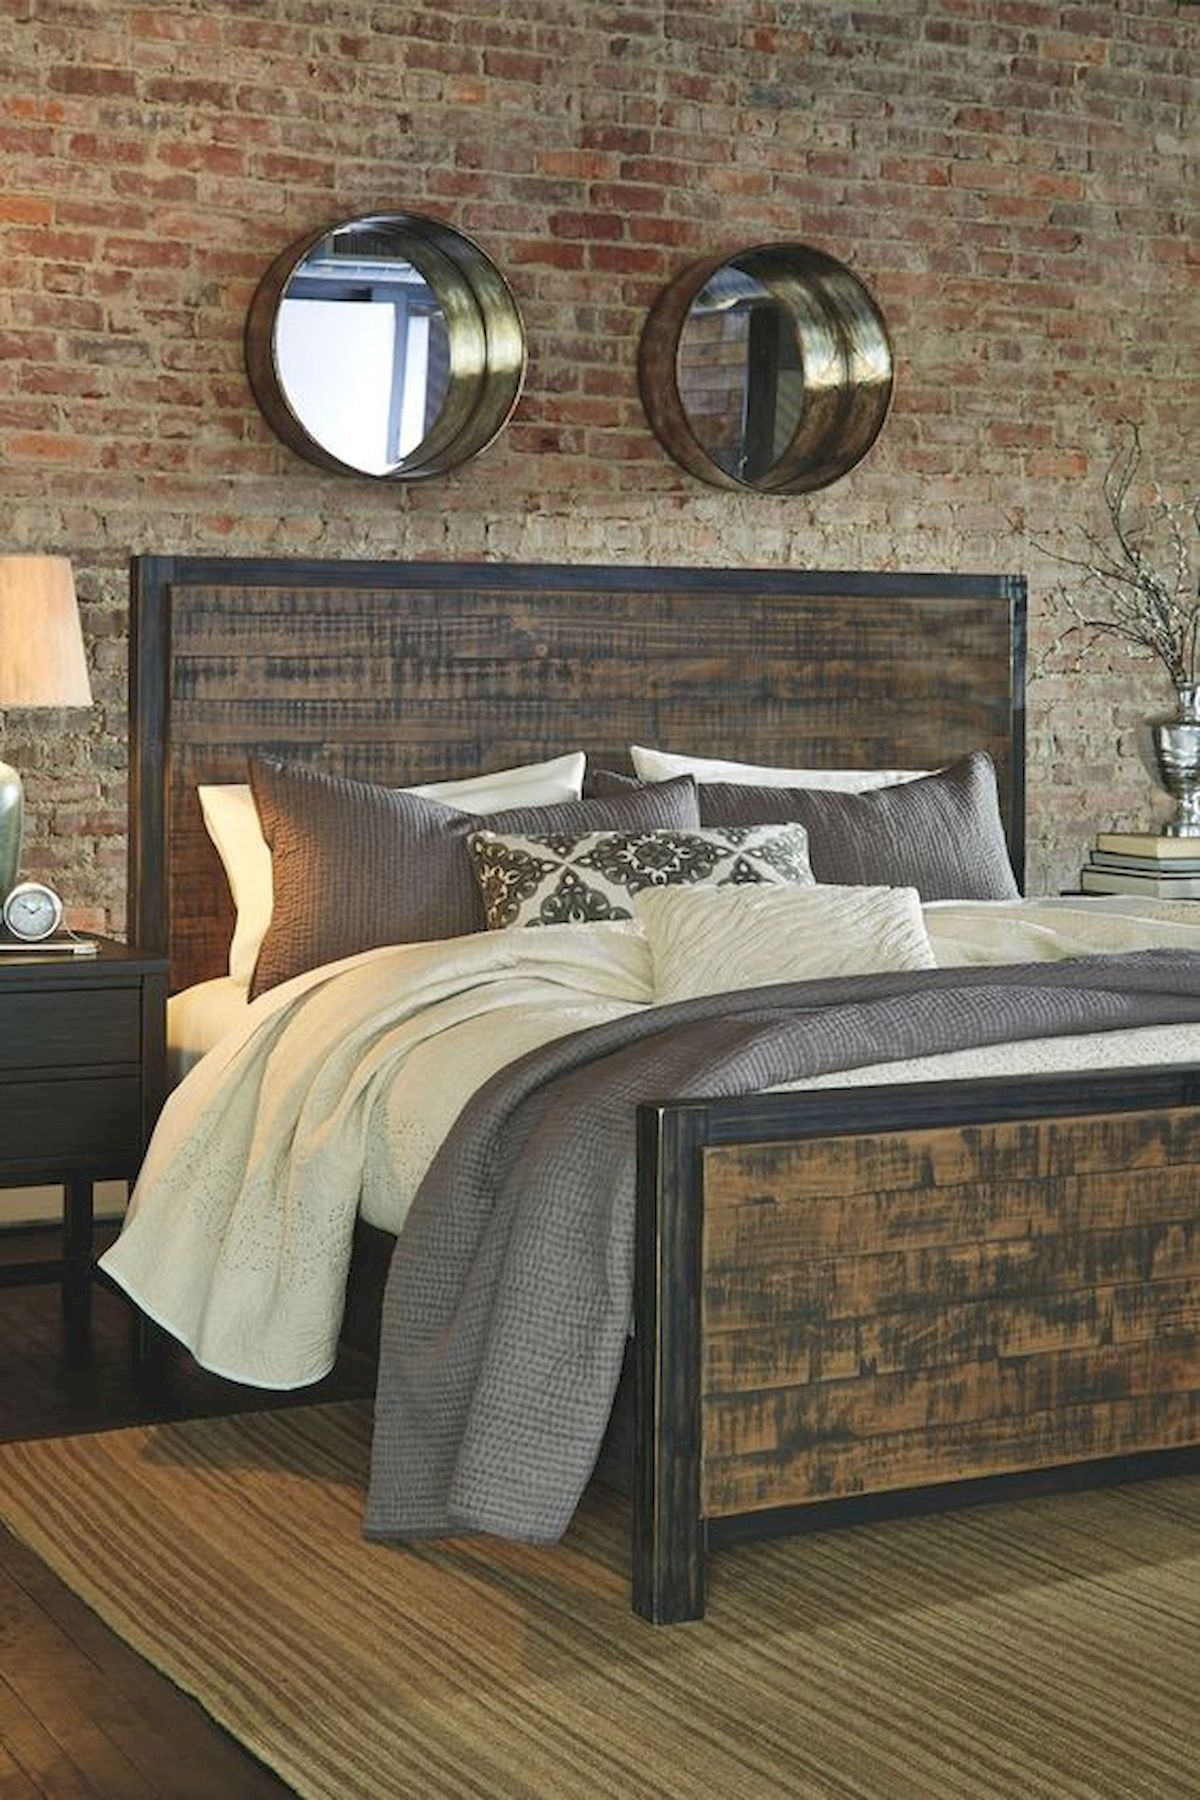 40 Fantastic DIY Decor Ideas For Farmhouse Boho Bedroom Design (24)